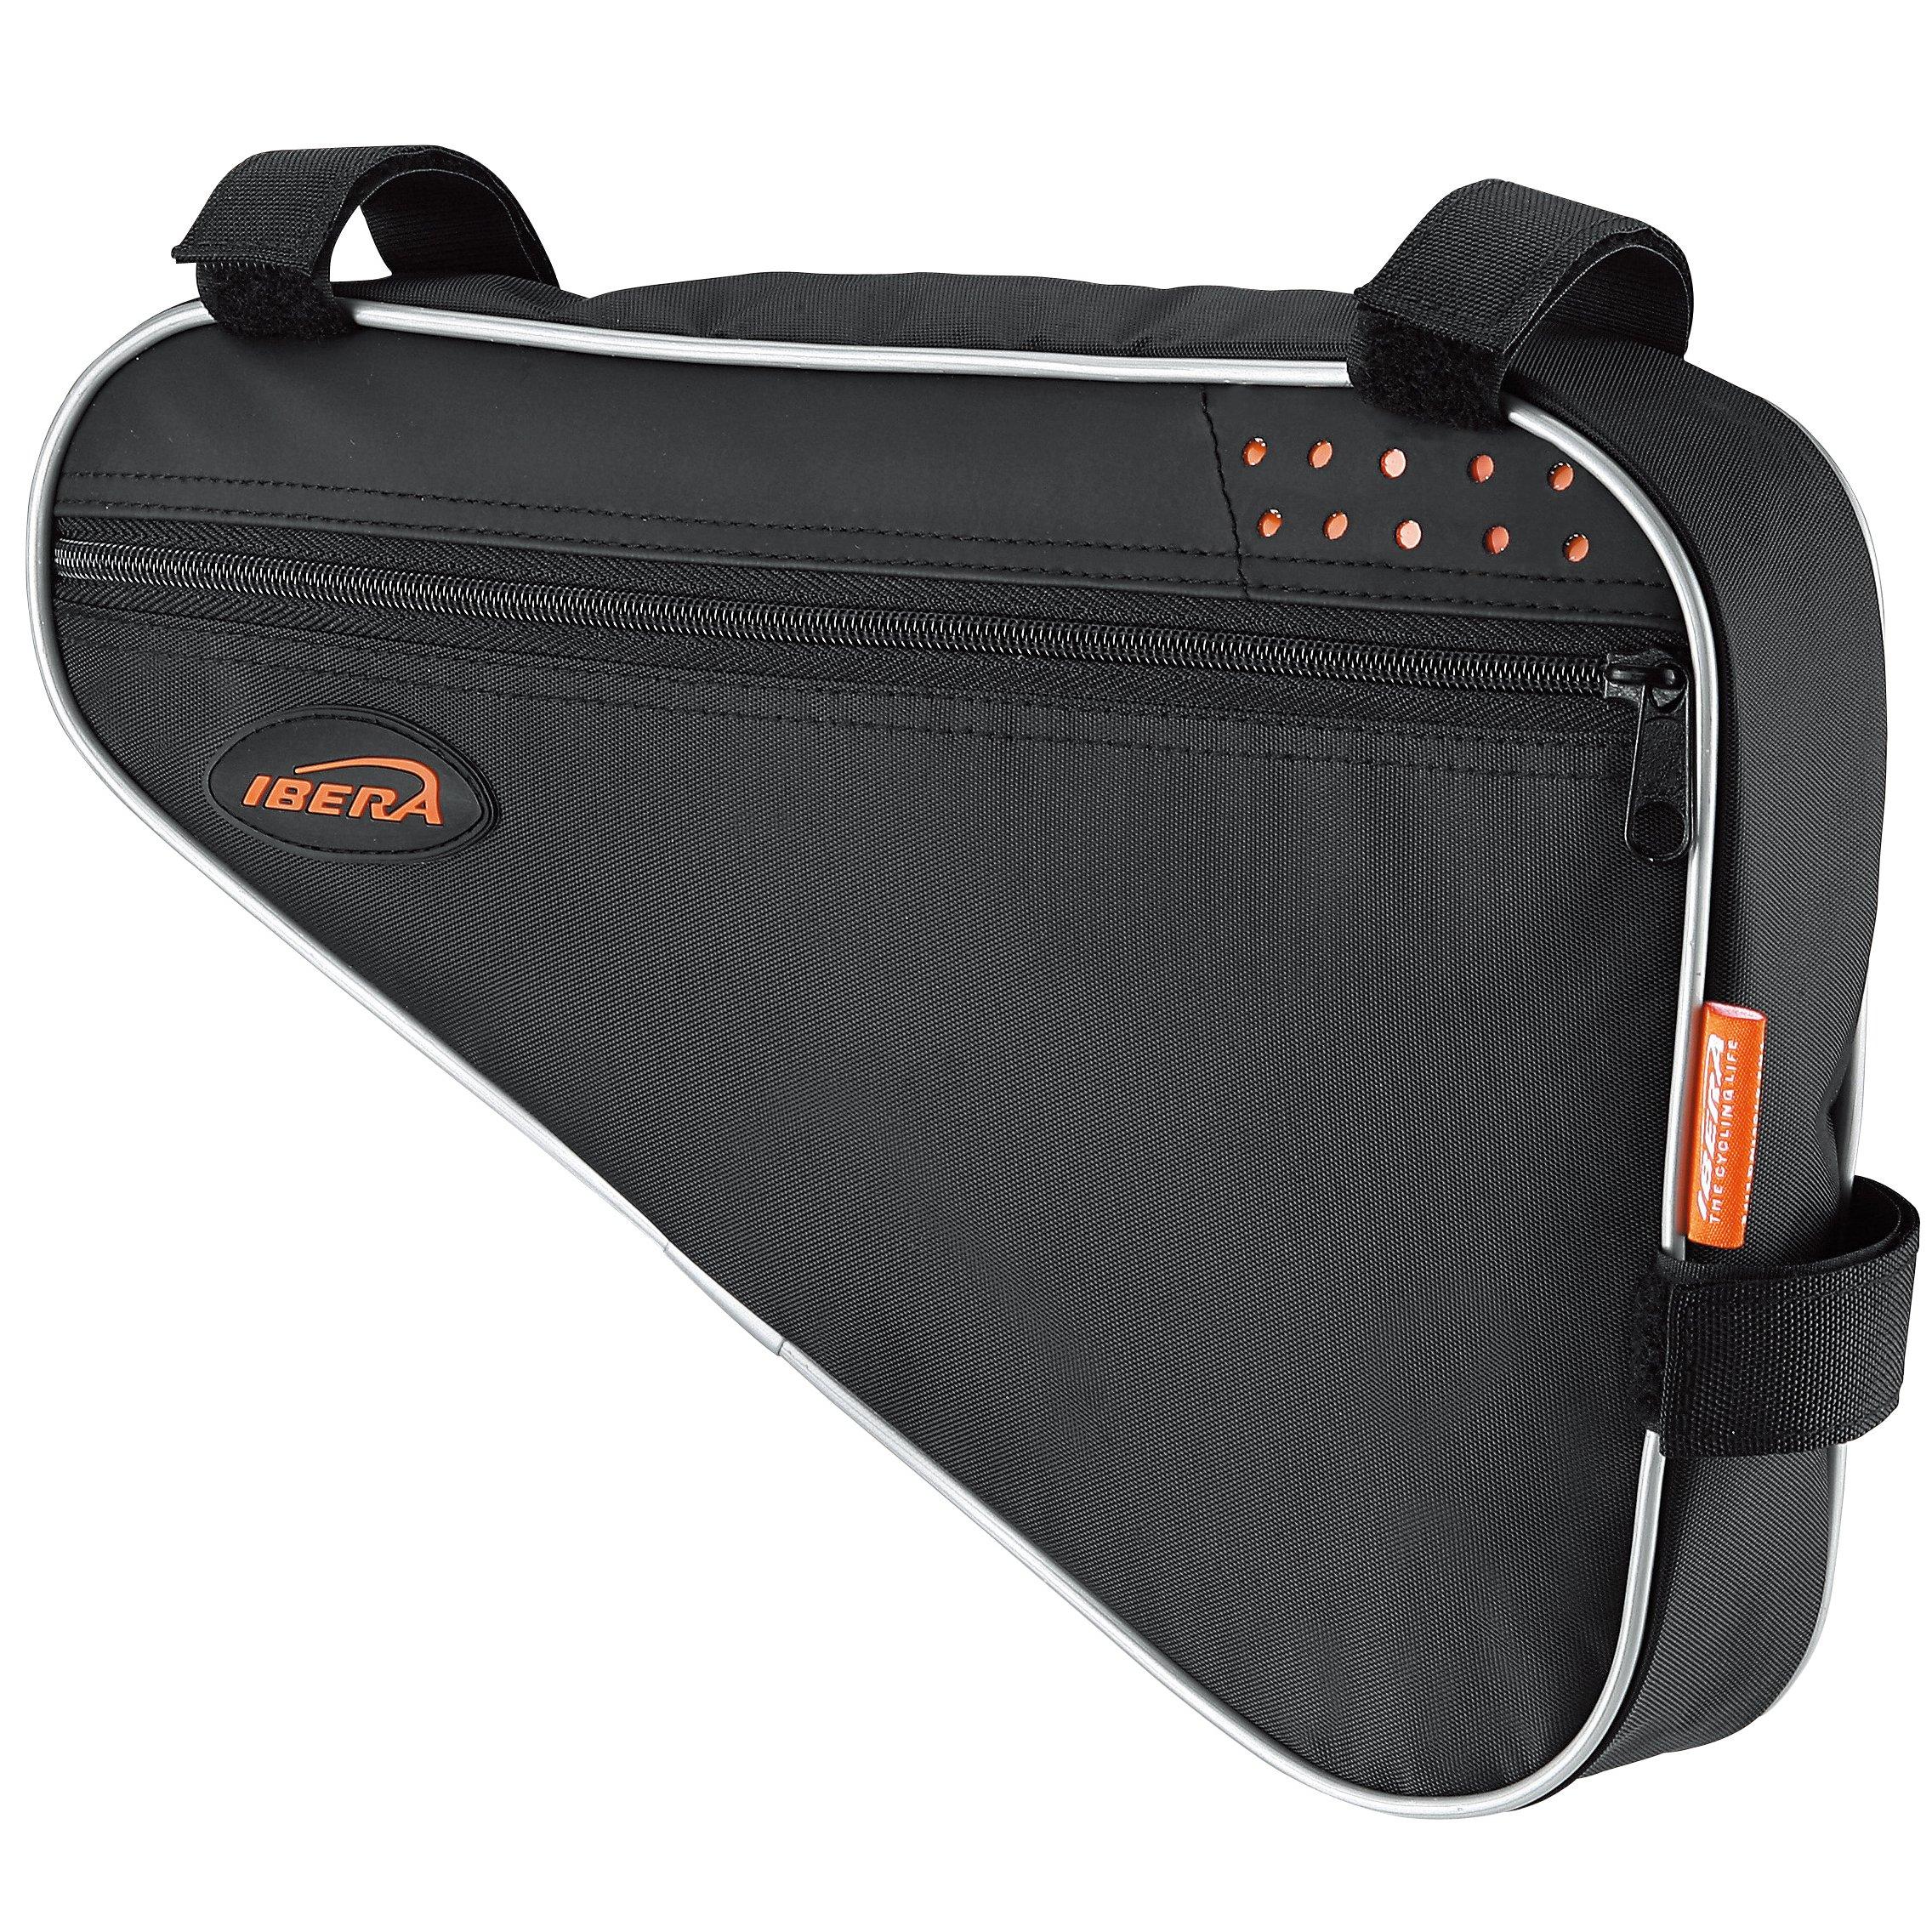 Ibera IB-FB1-M Bicycle Triangle Frame Bag, Strap-on Bike Top Tube Pouch, Cycling Essential Saddle Frame Bag with Reflective Trim, Crossbar Bike Pack(Medium: 3L Capacity)